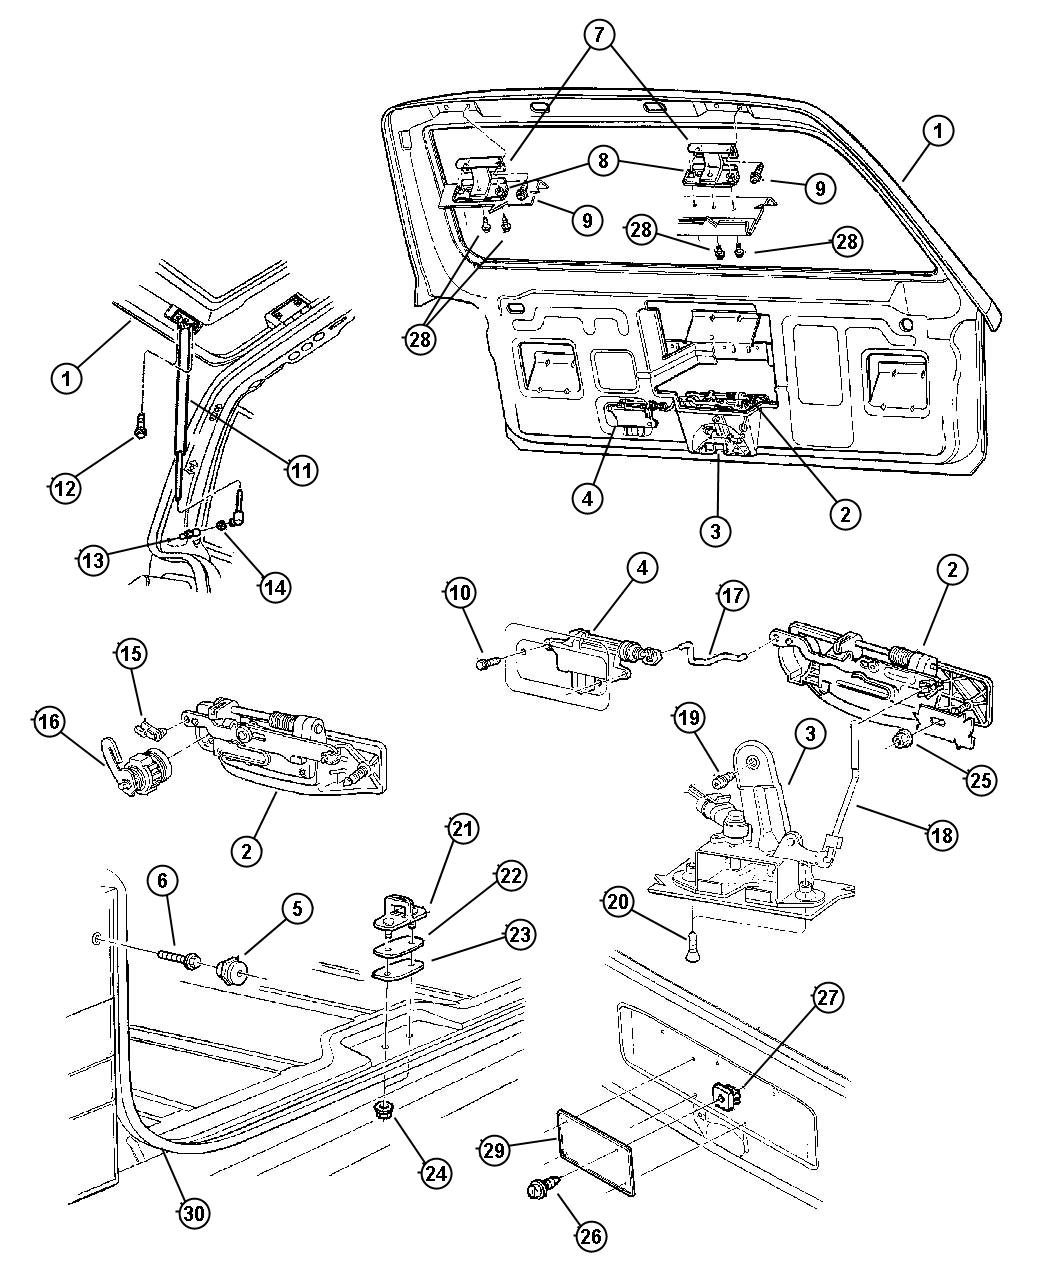 2000 jeep grand cherokee headlight wiring diagram 1997 bmw z3 stereo fog lights imageresizertool com